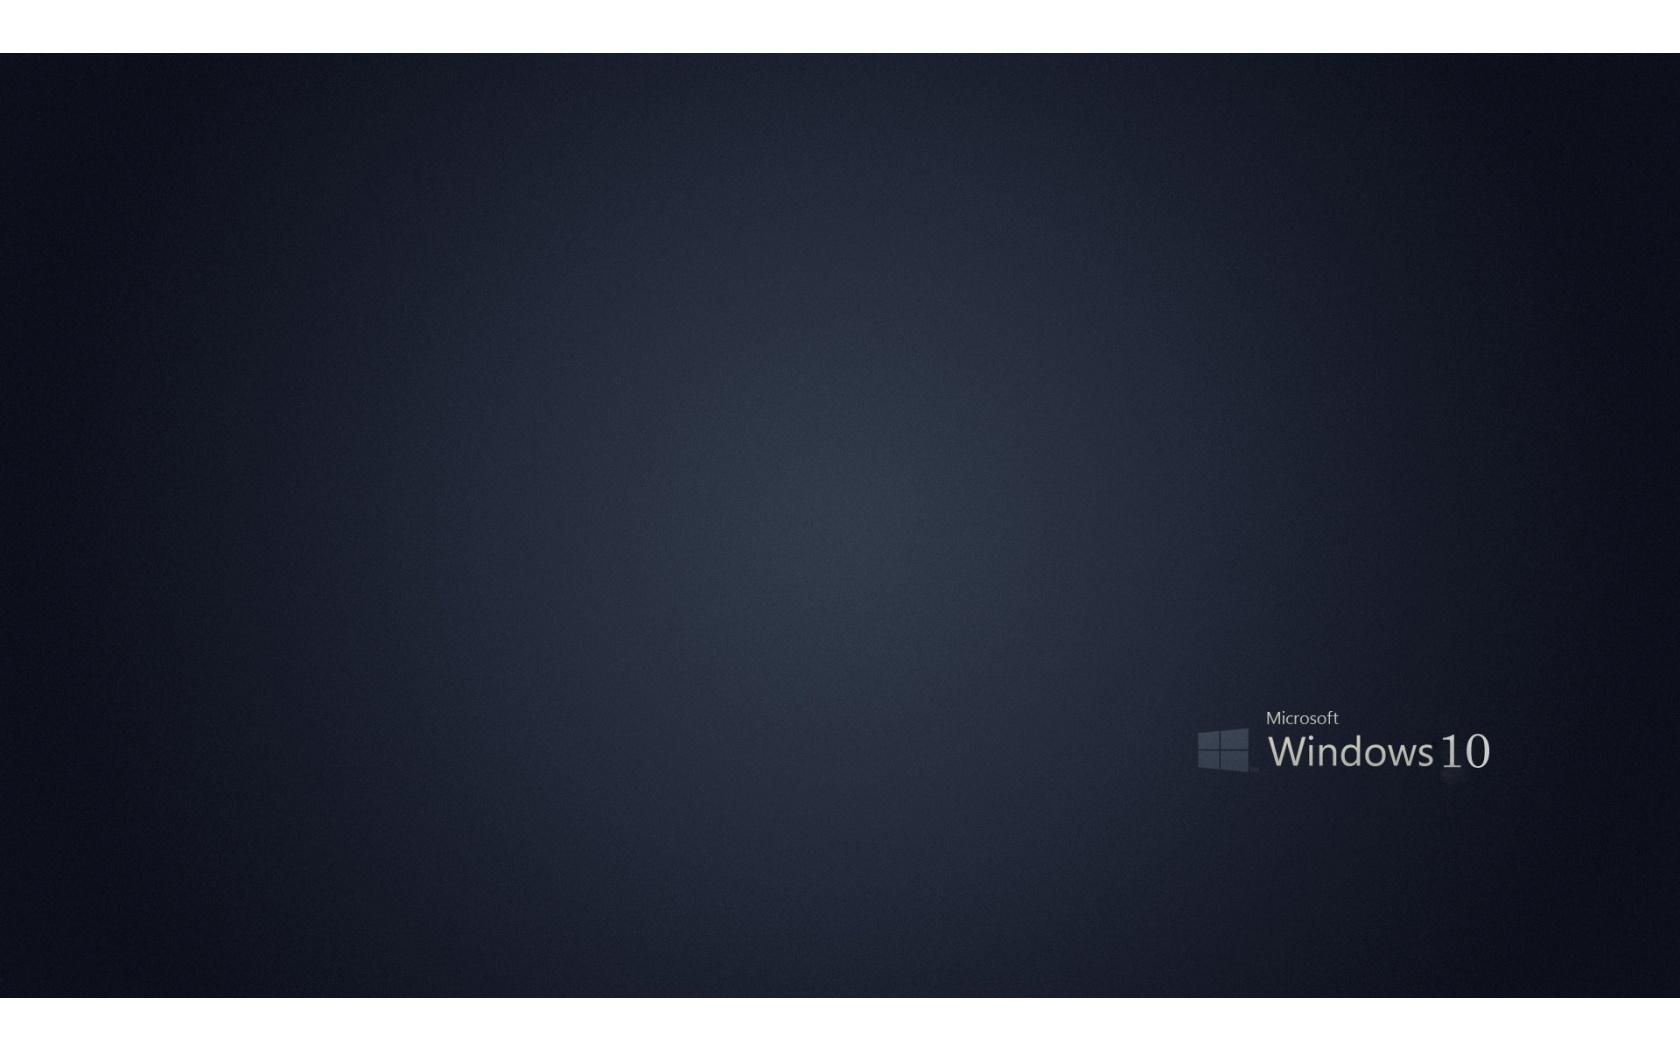 sub categories windows 10 tags windows ten windows 10 gray grey 1680x1050